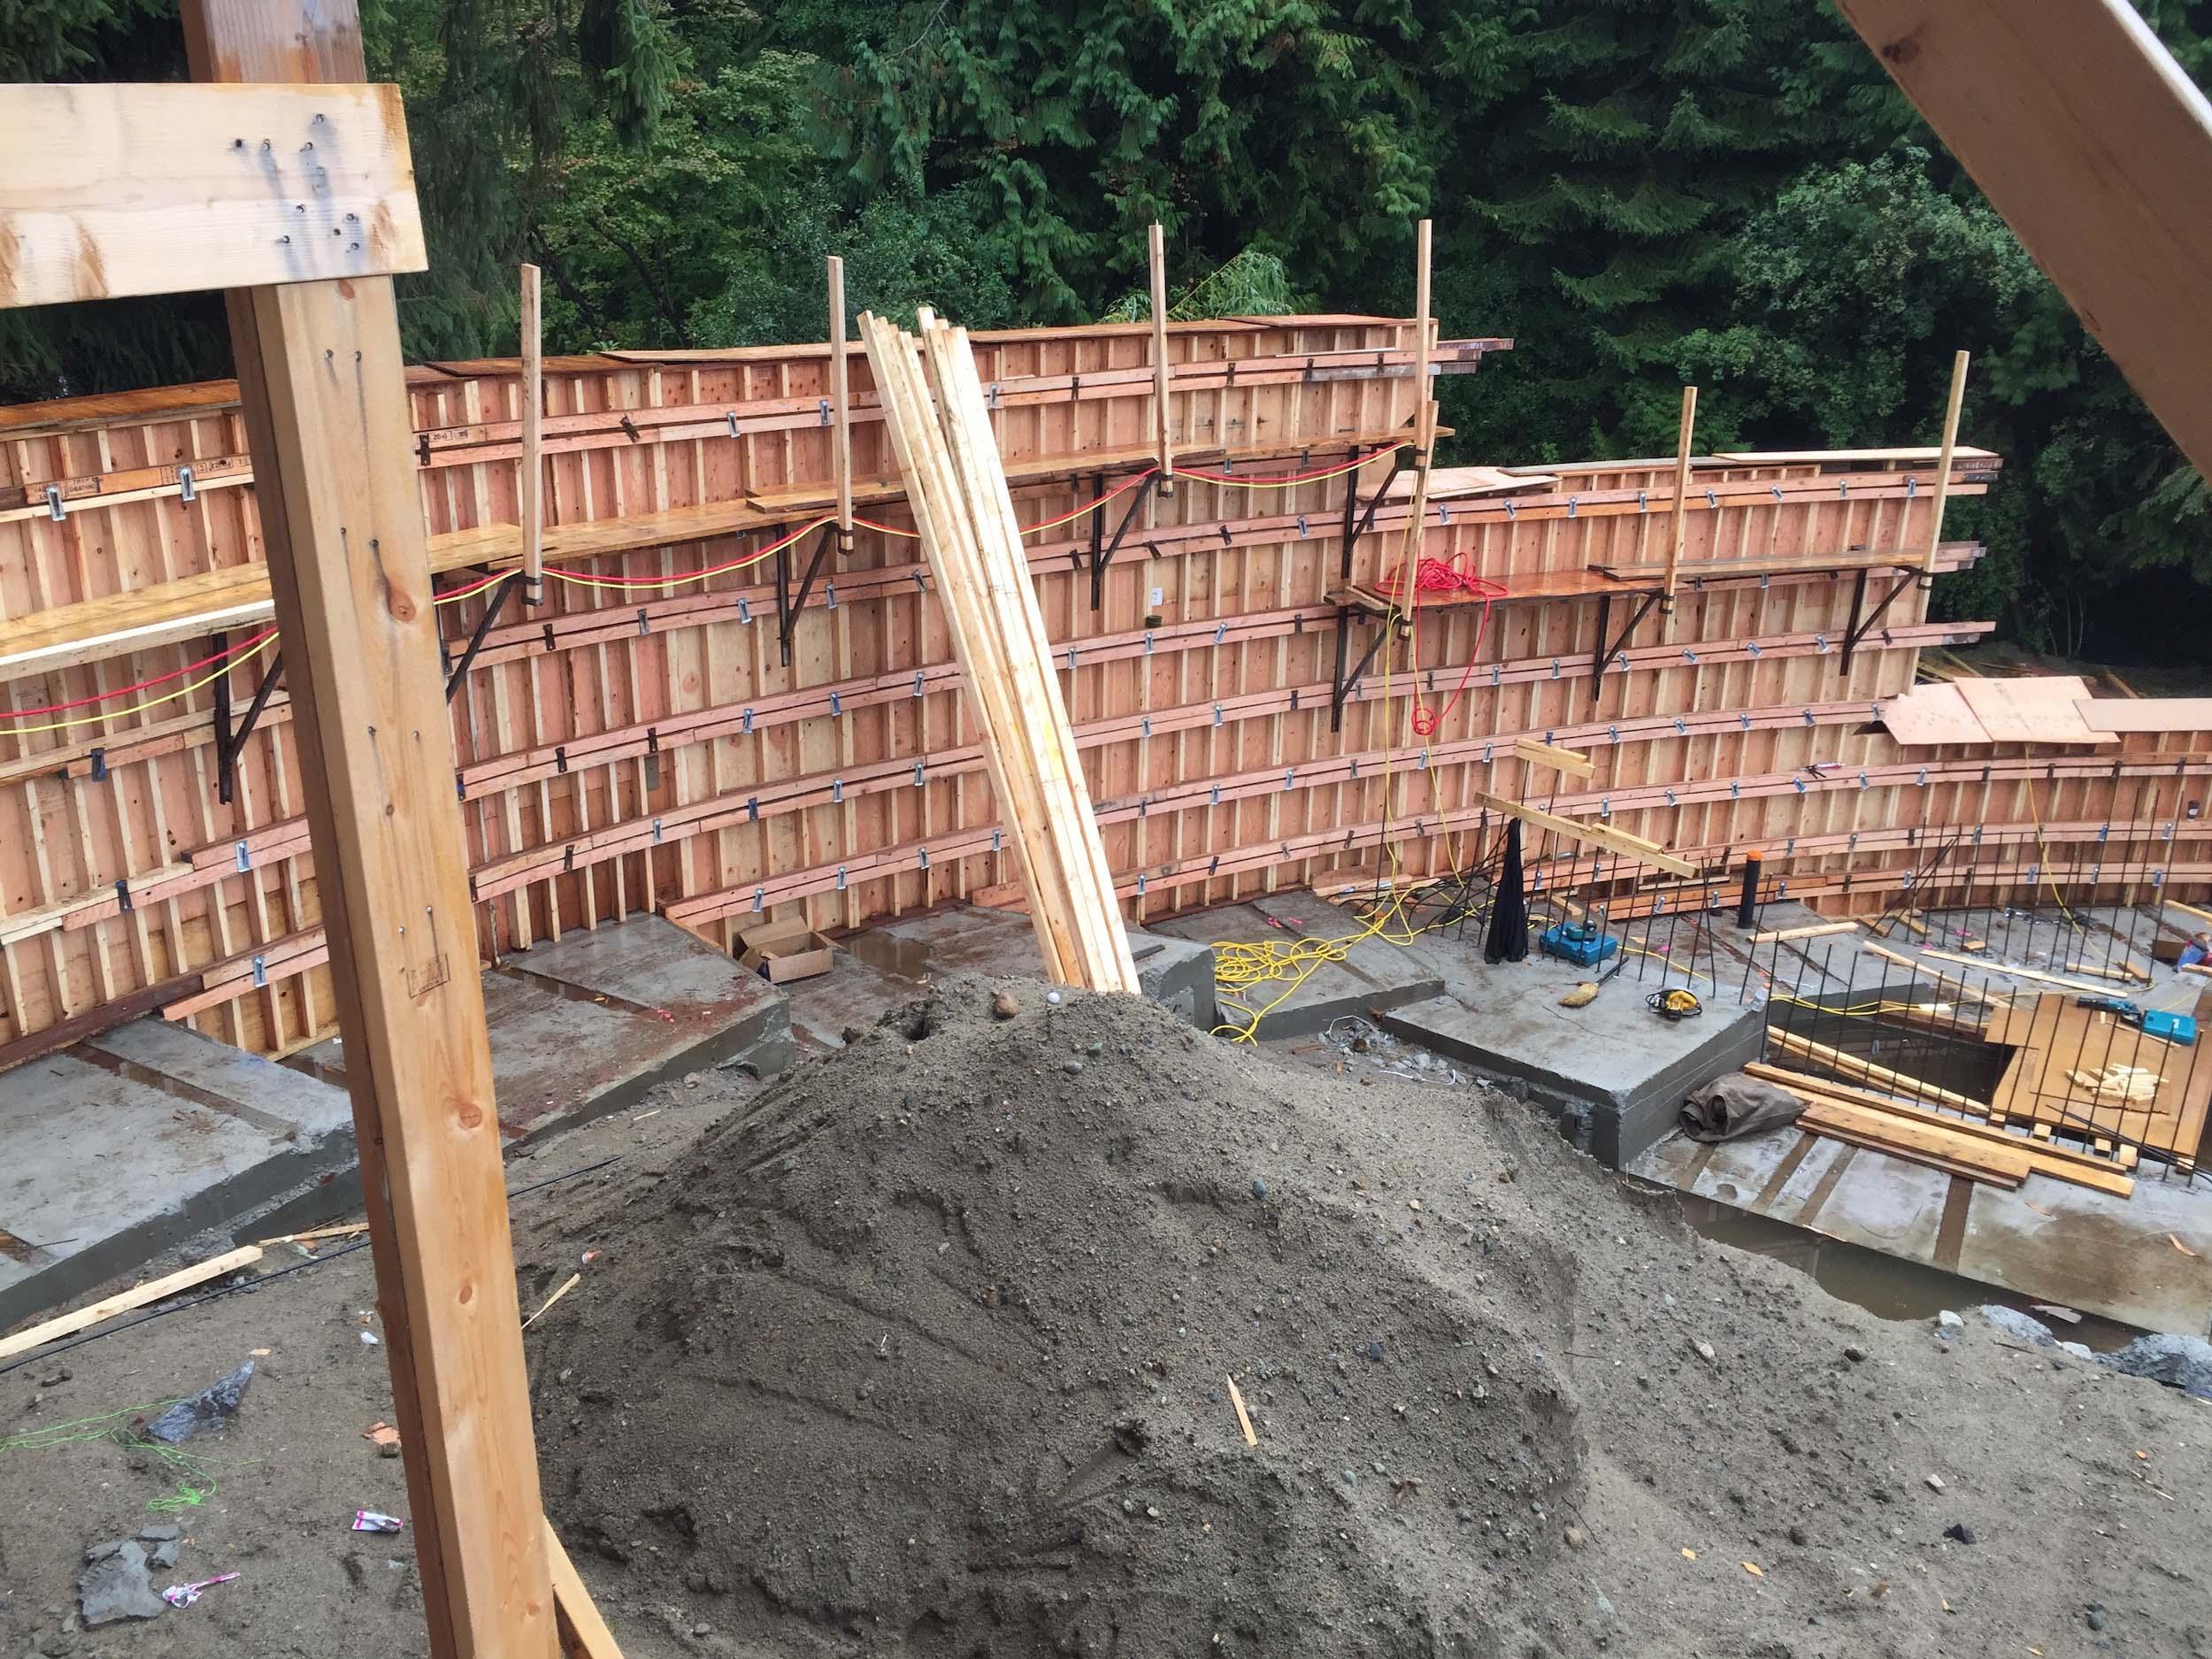 Postle_Construction_ConcreteForming8.jpg